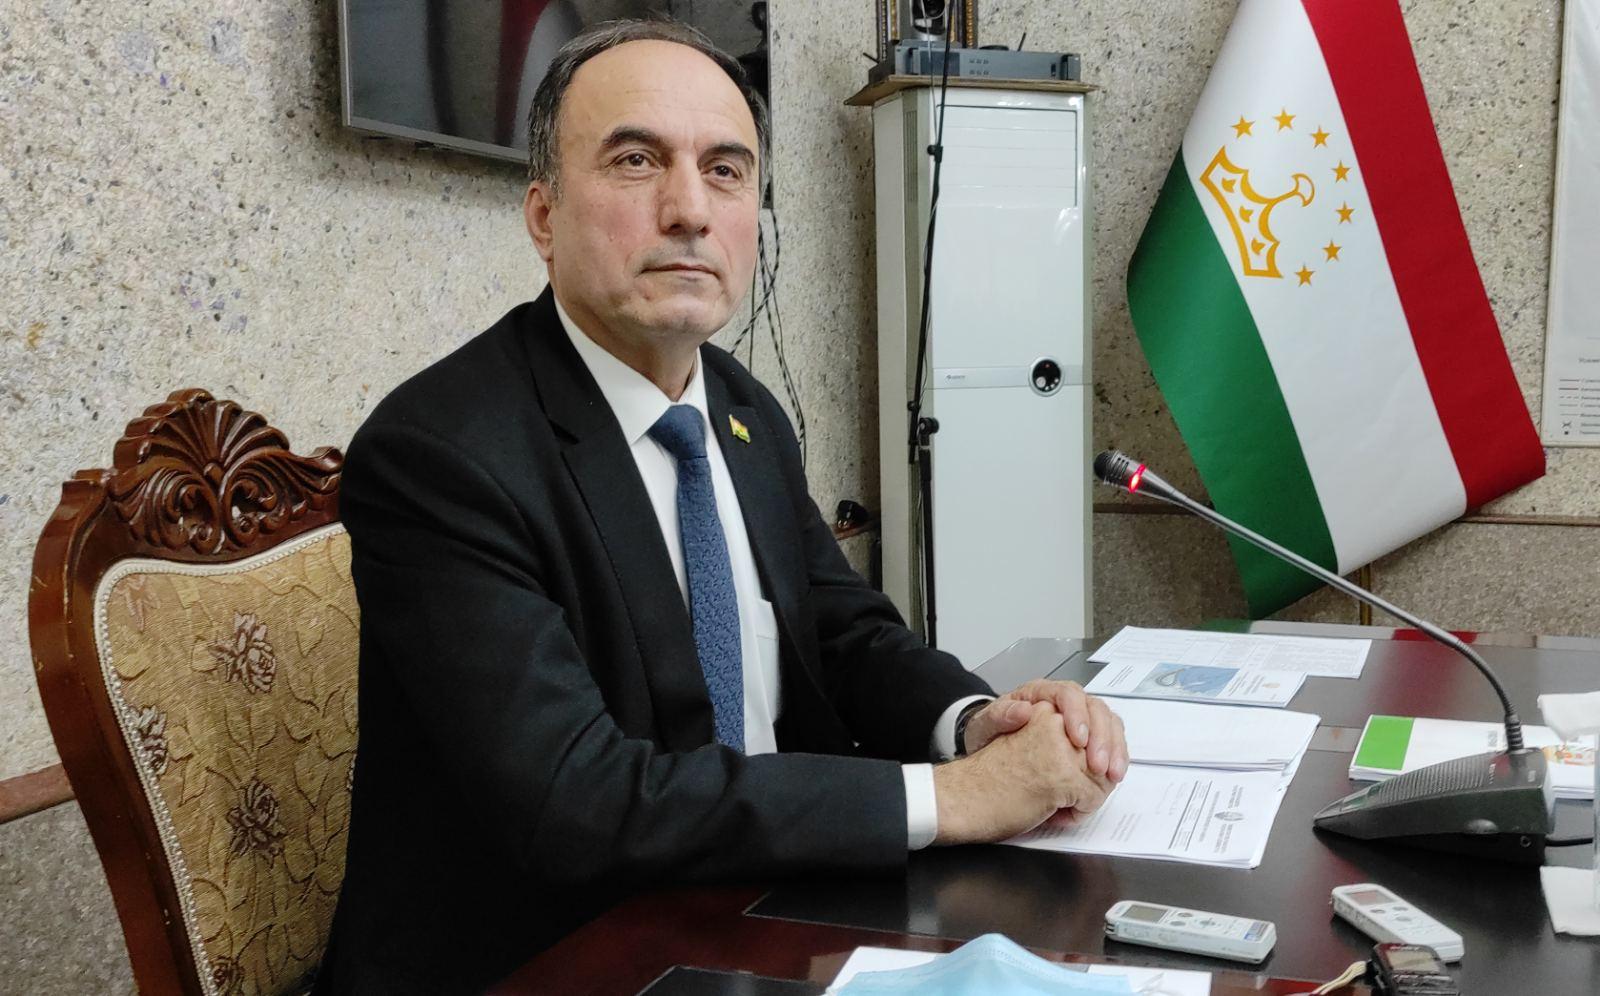 Пандемия нанесла ущерб сфере перевозок Таджикистана на 300 миллионов сомони